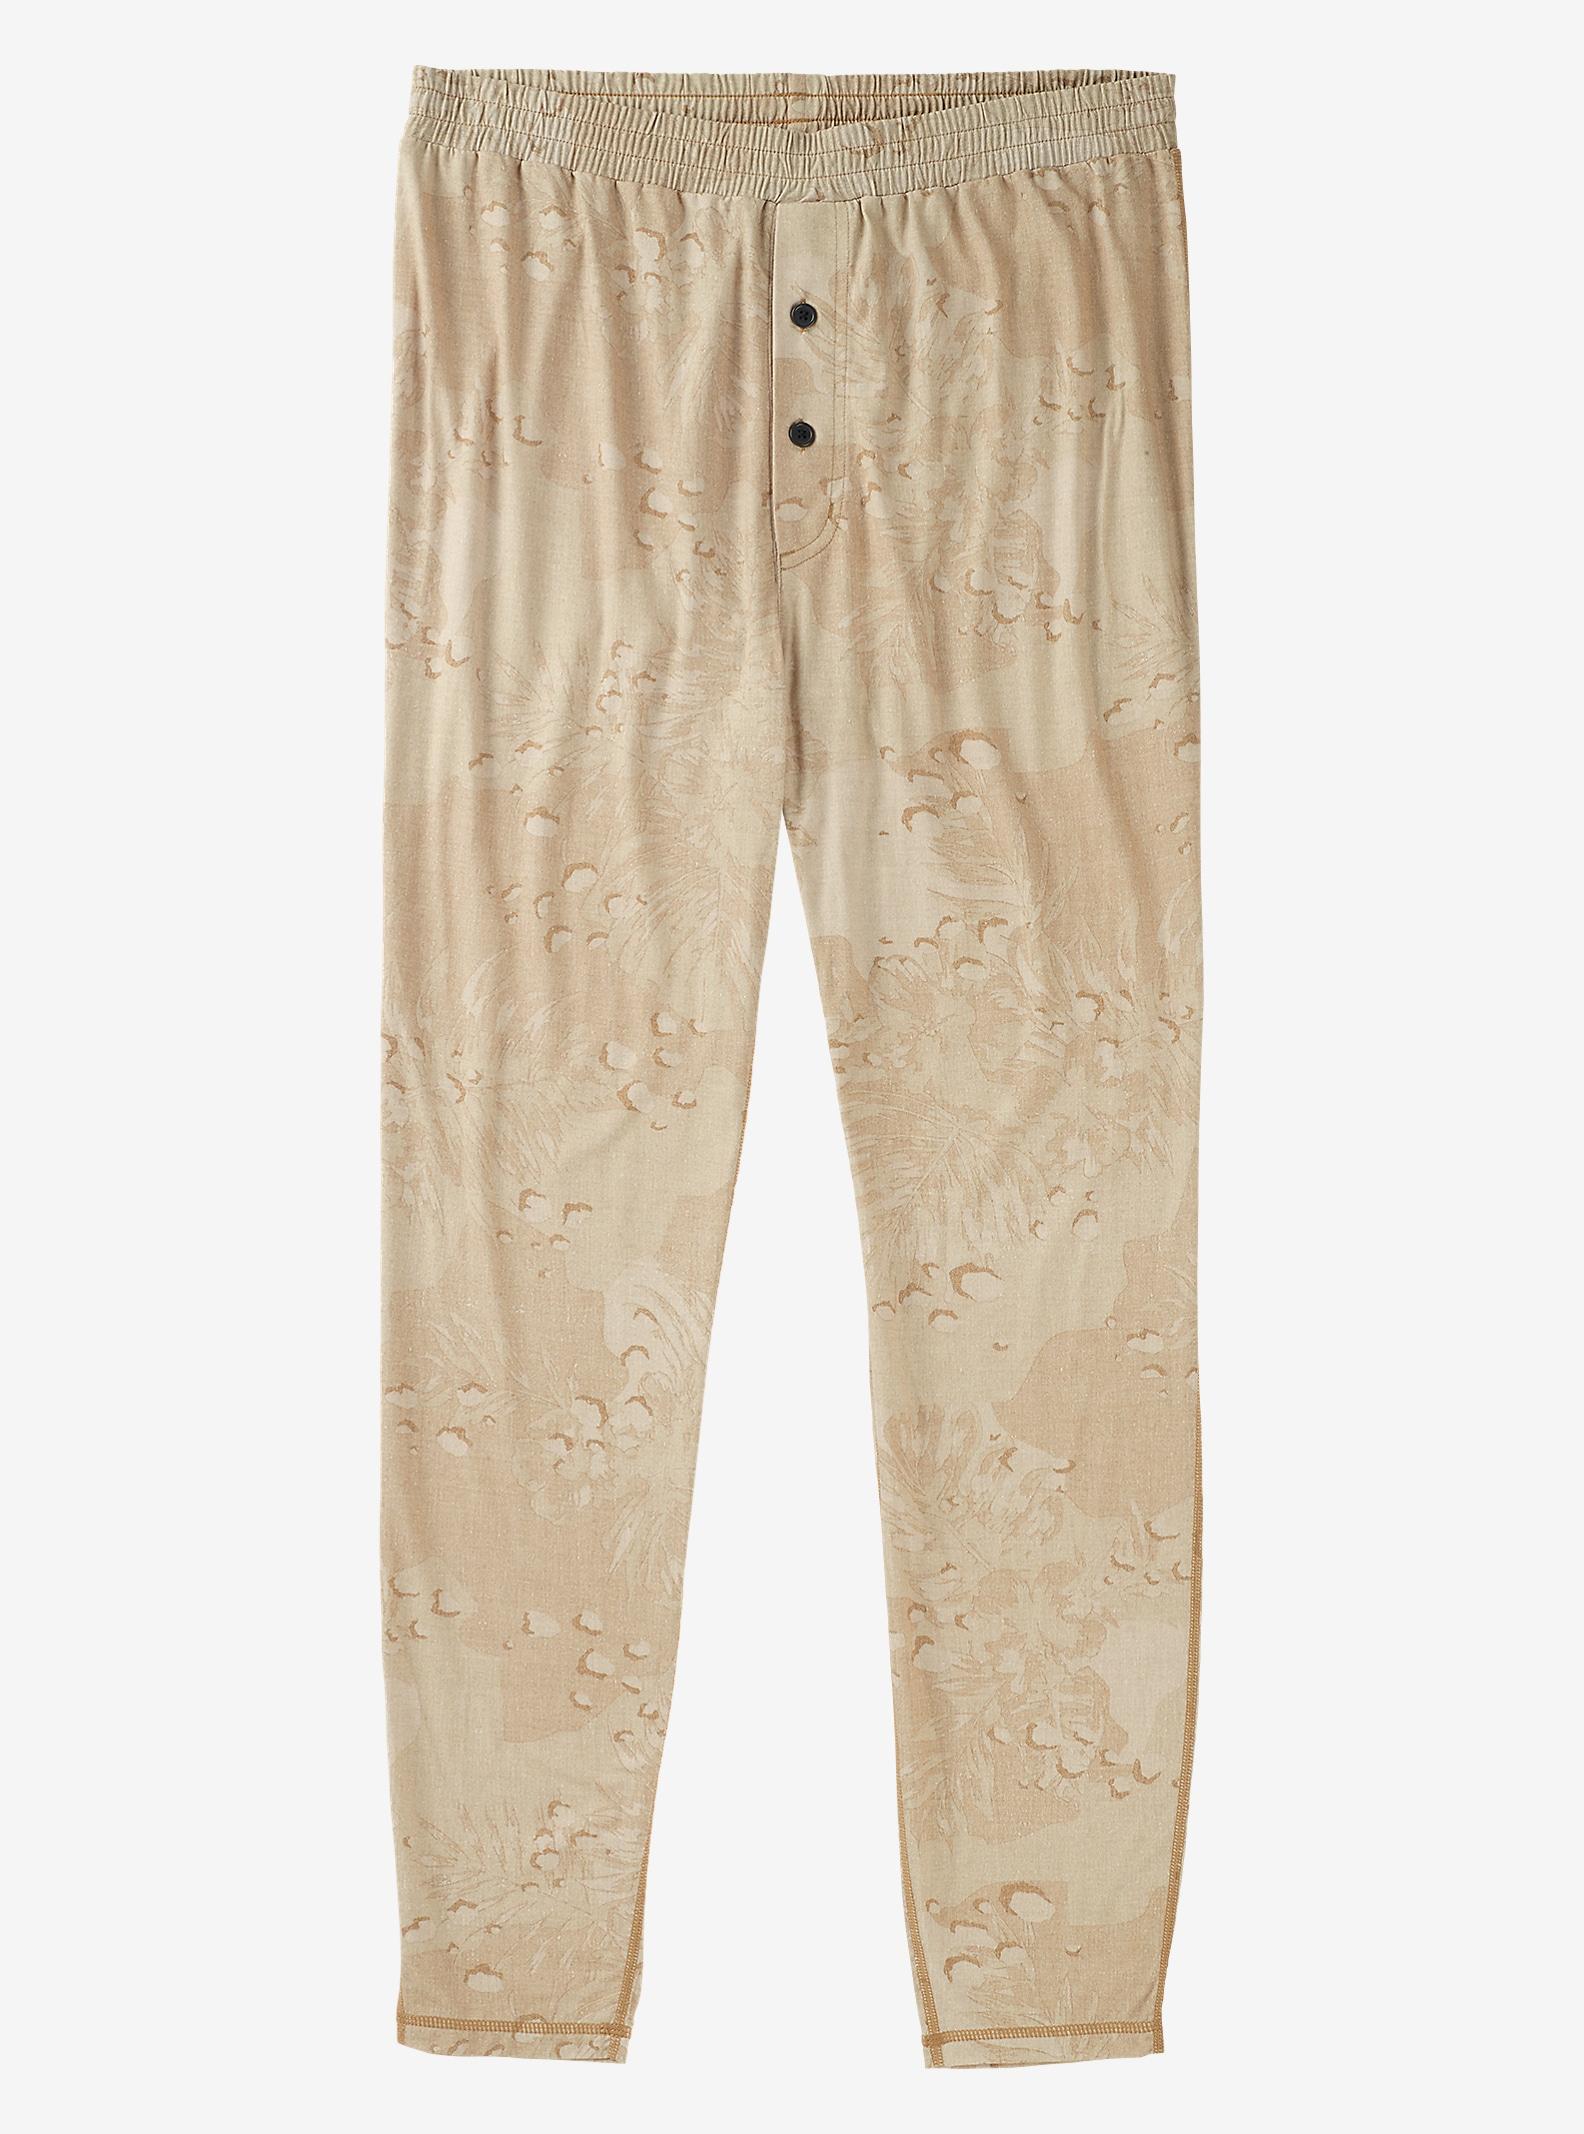 Burton Midweight Base Layer Wool Pant shown in Hawaiian Desert